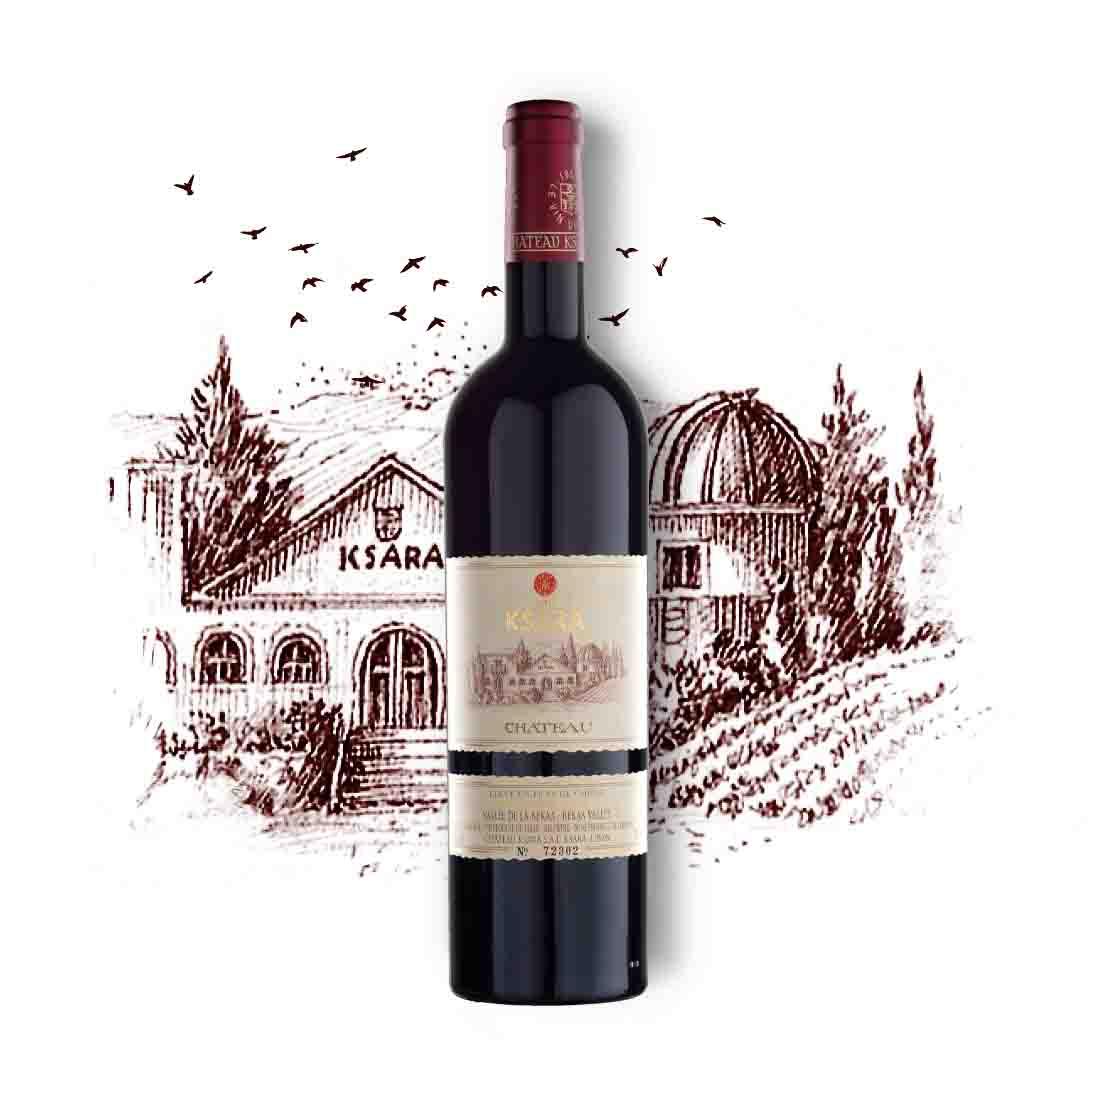 chateau ksara collectible vintage Lebanese red wine cabernet sauvignon merlot petit Verdot bekaa